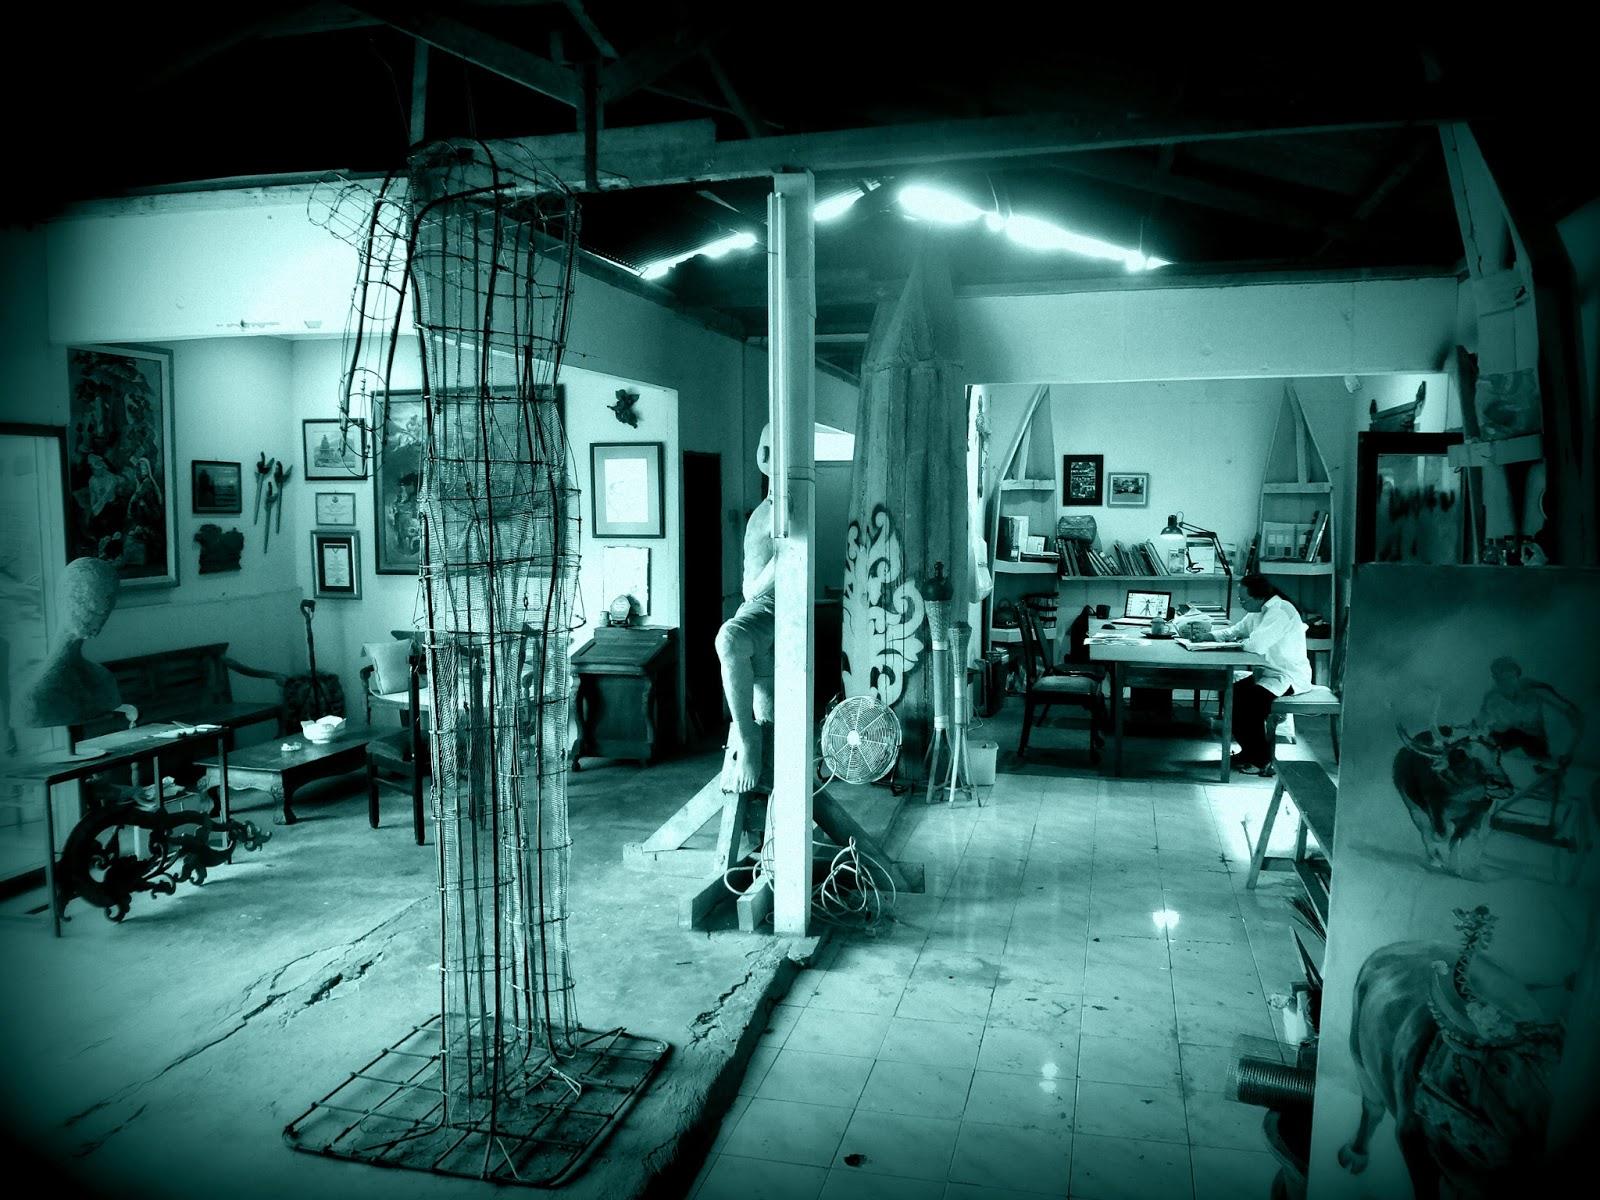 Studio Patung Tikno November 2012 Alamat Jalan Ahmad Yani 36